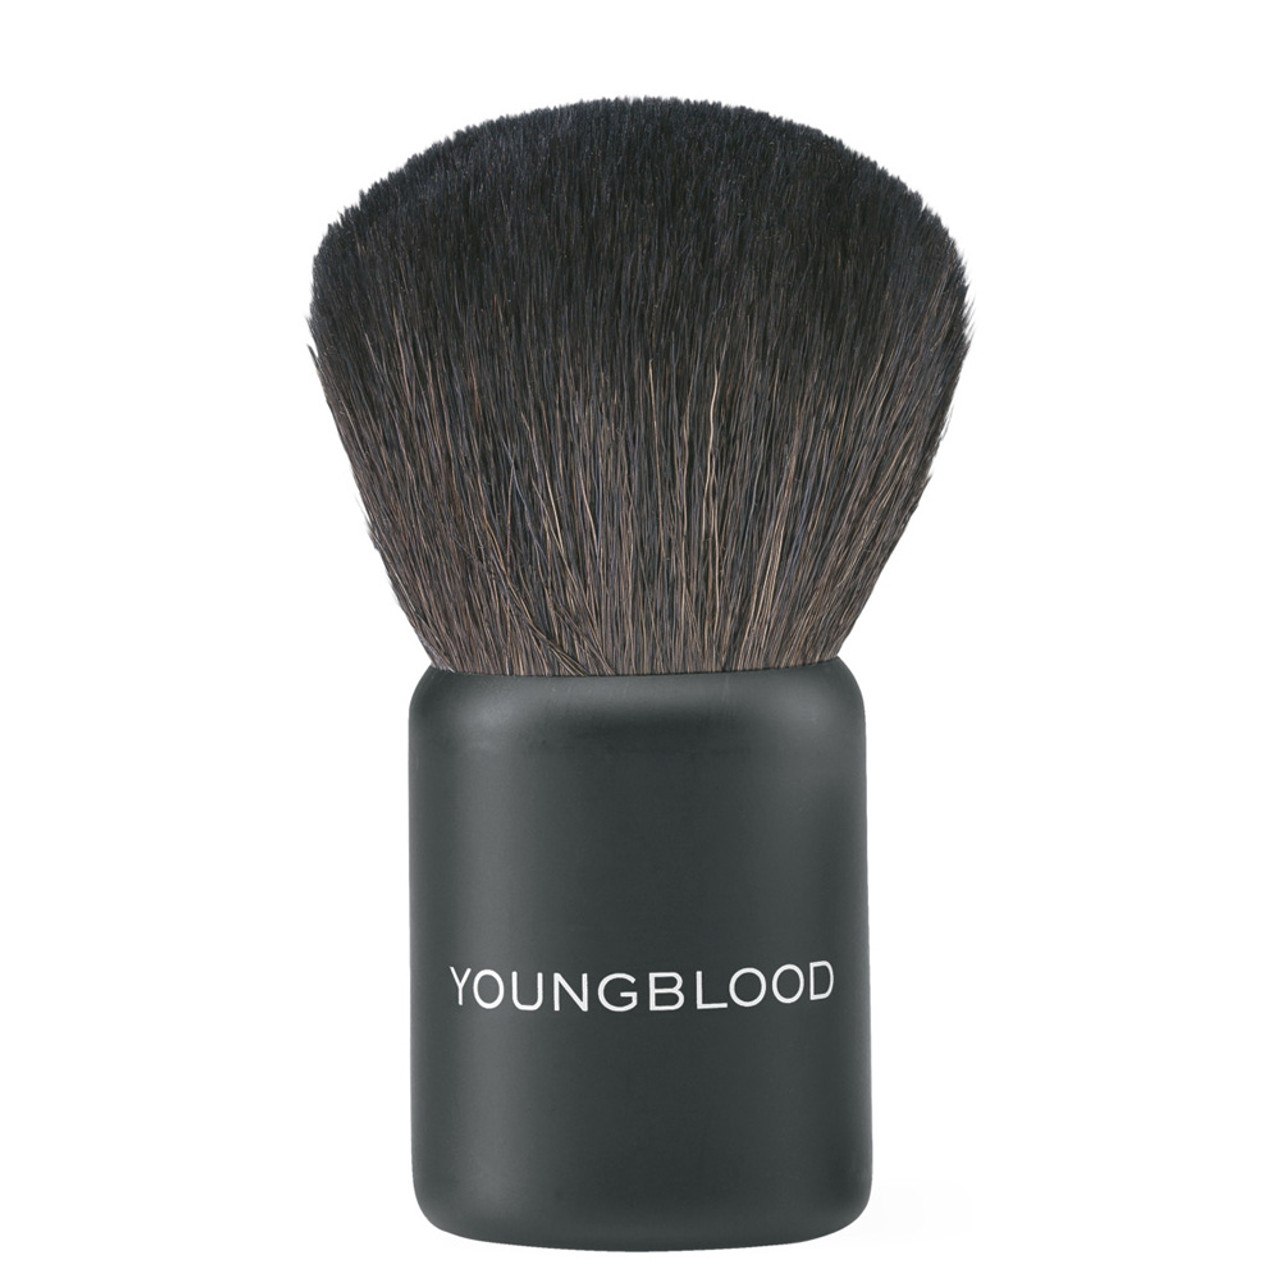 Youngblood Small Kabuki Brush BeautifiedYou.com